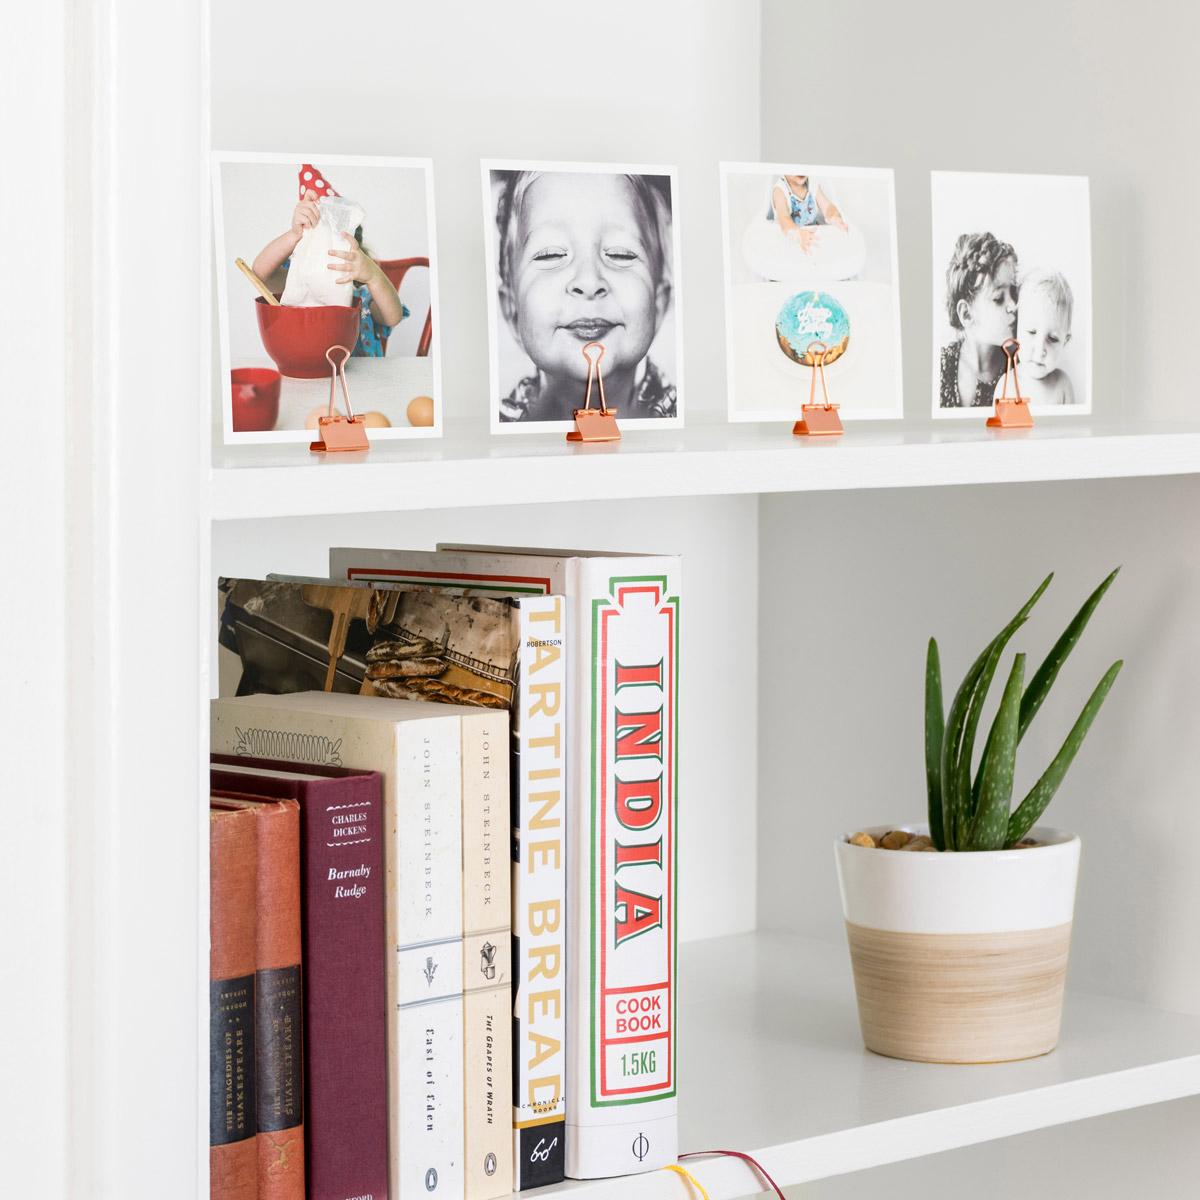 Binder clips used as photo holders to display Artifact Uprising Photo Prints on bookshelf